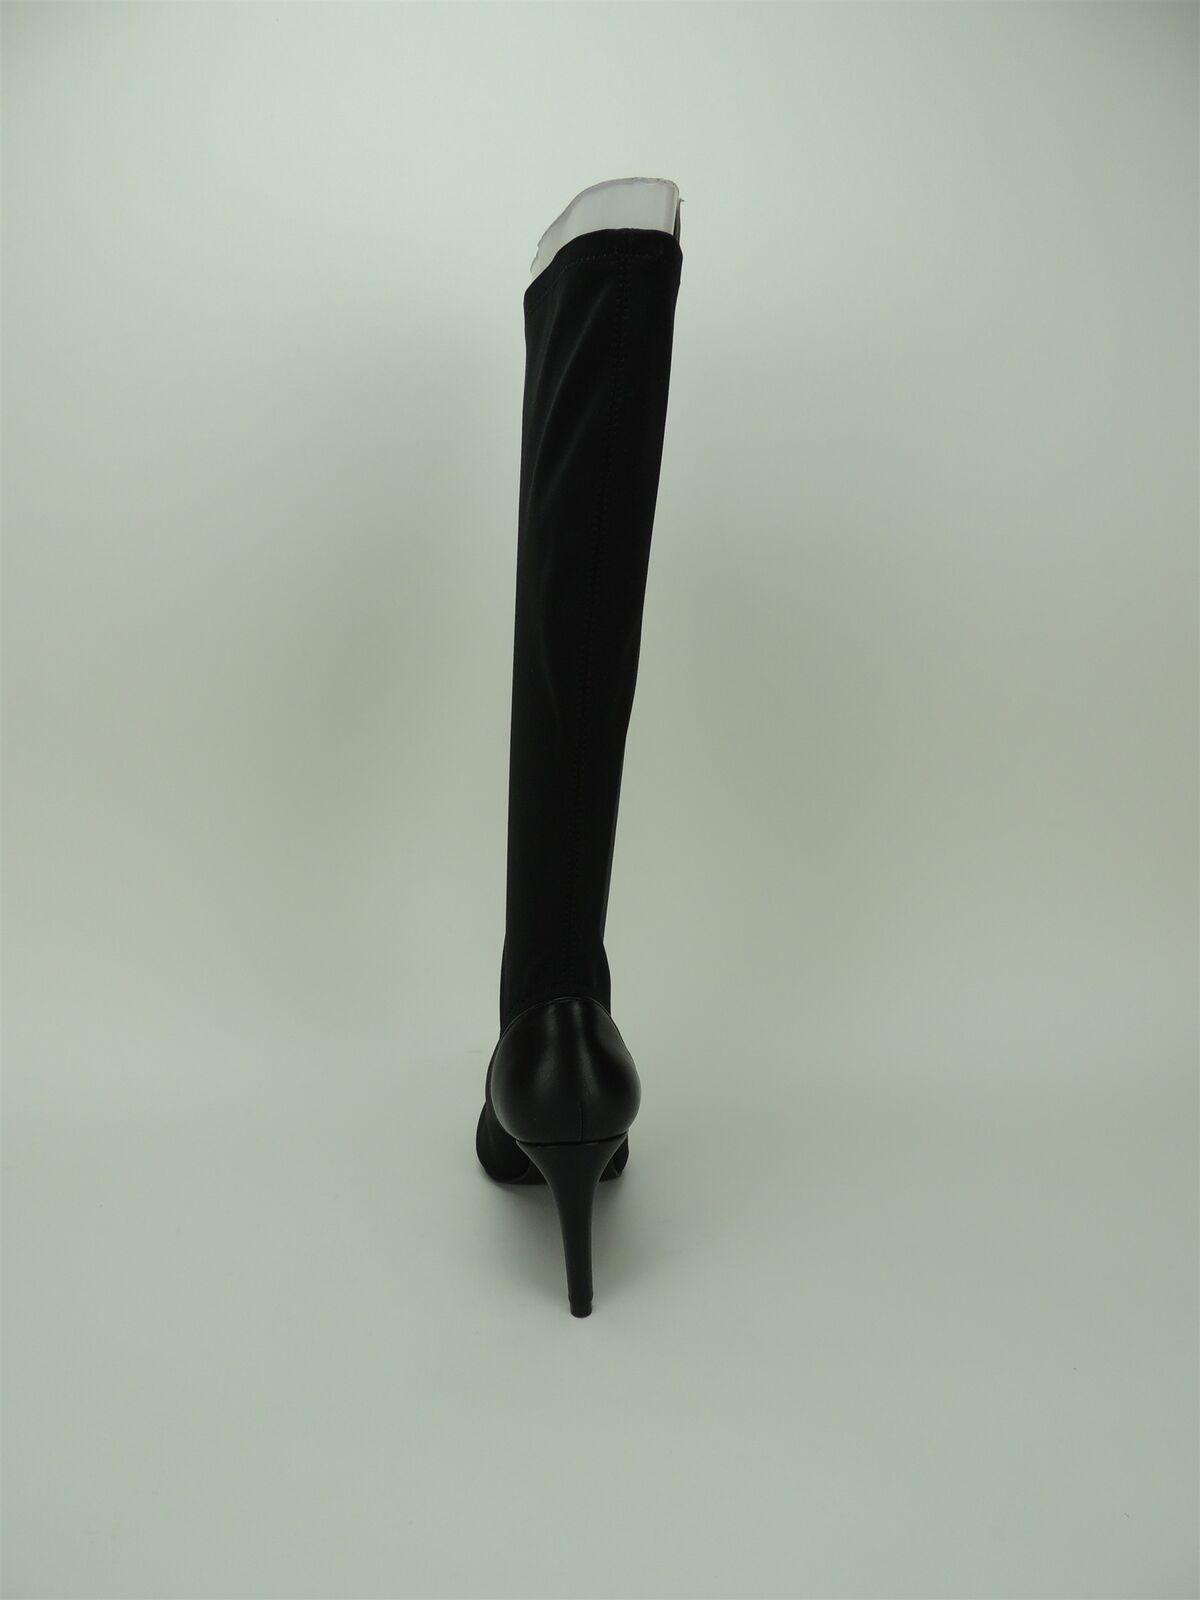 Charles por Charles Superestrella David para mujer botas Elástico Alto Superestrella Charles Negro Talla 5 M a34dfb